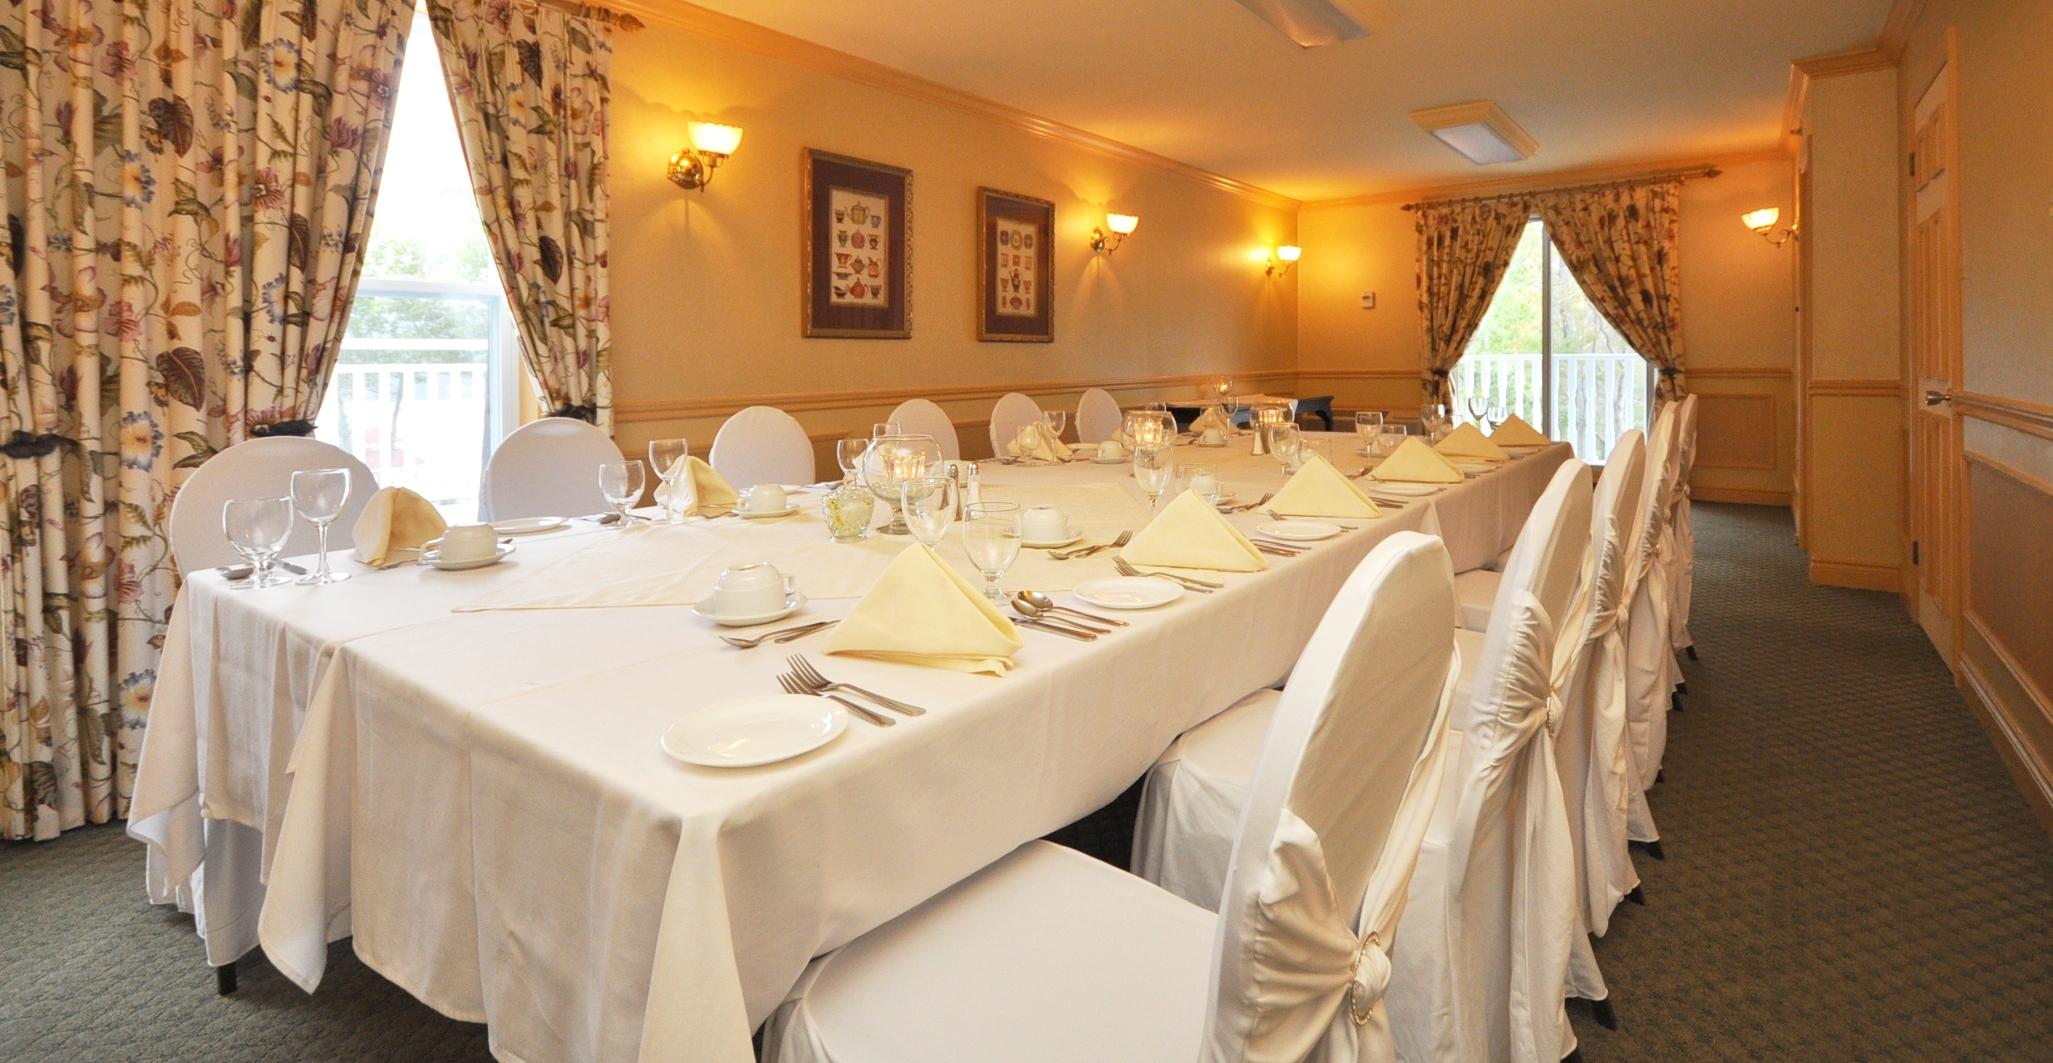 Thomas seats 8 to 12 guests